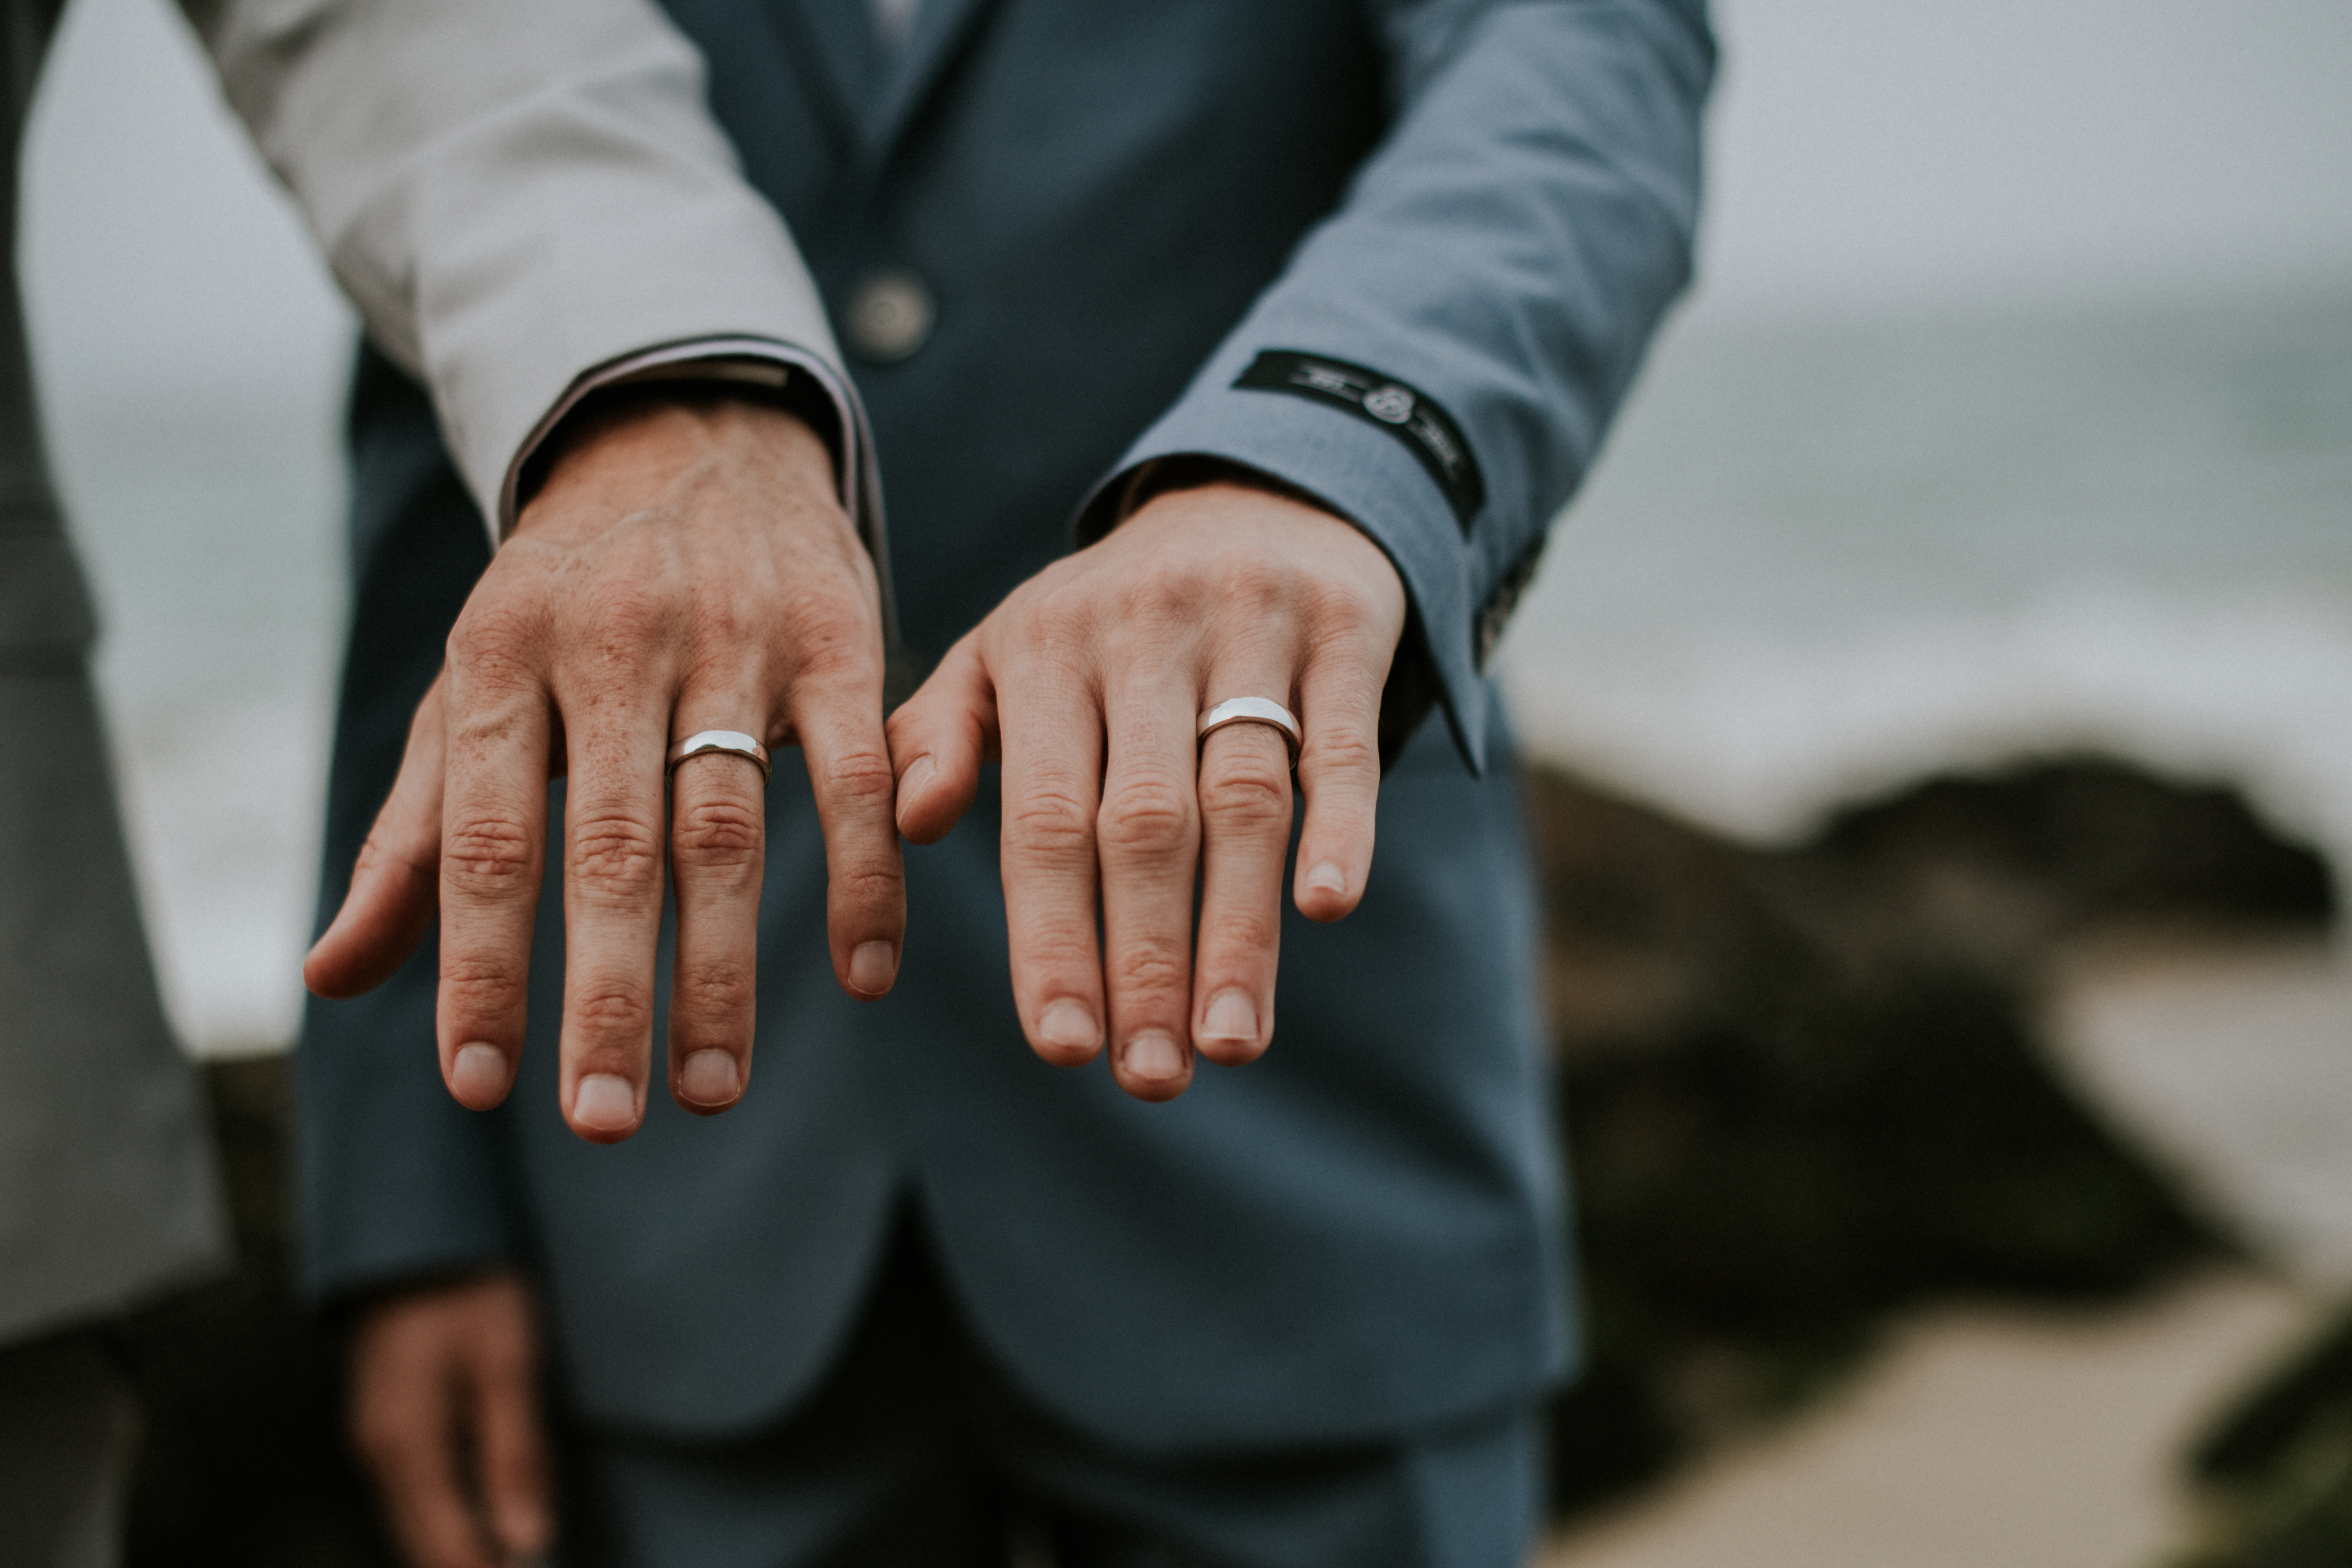 grooms wedding rings detail wedding photography gay wedding point dume beach malibu california